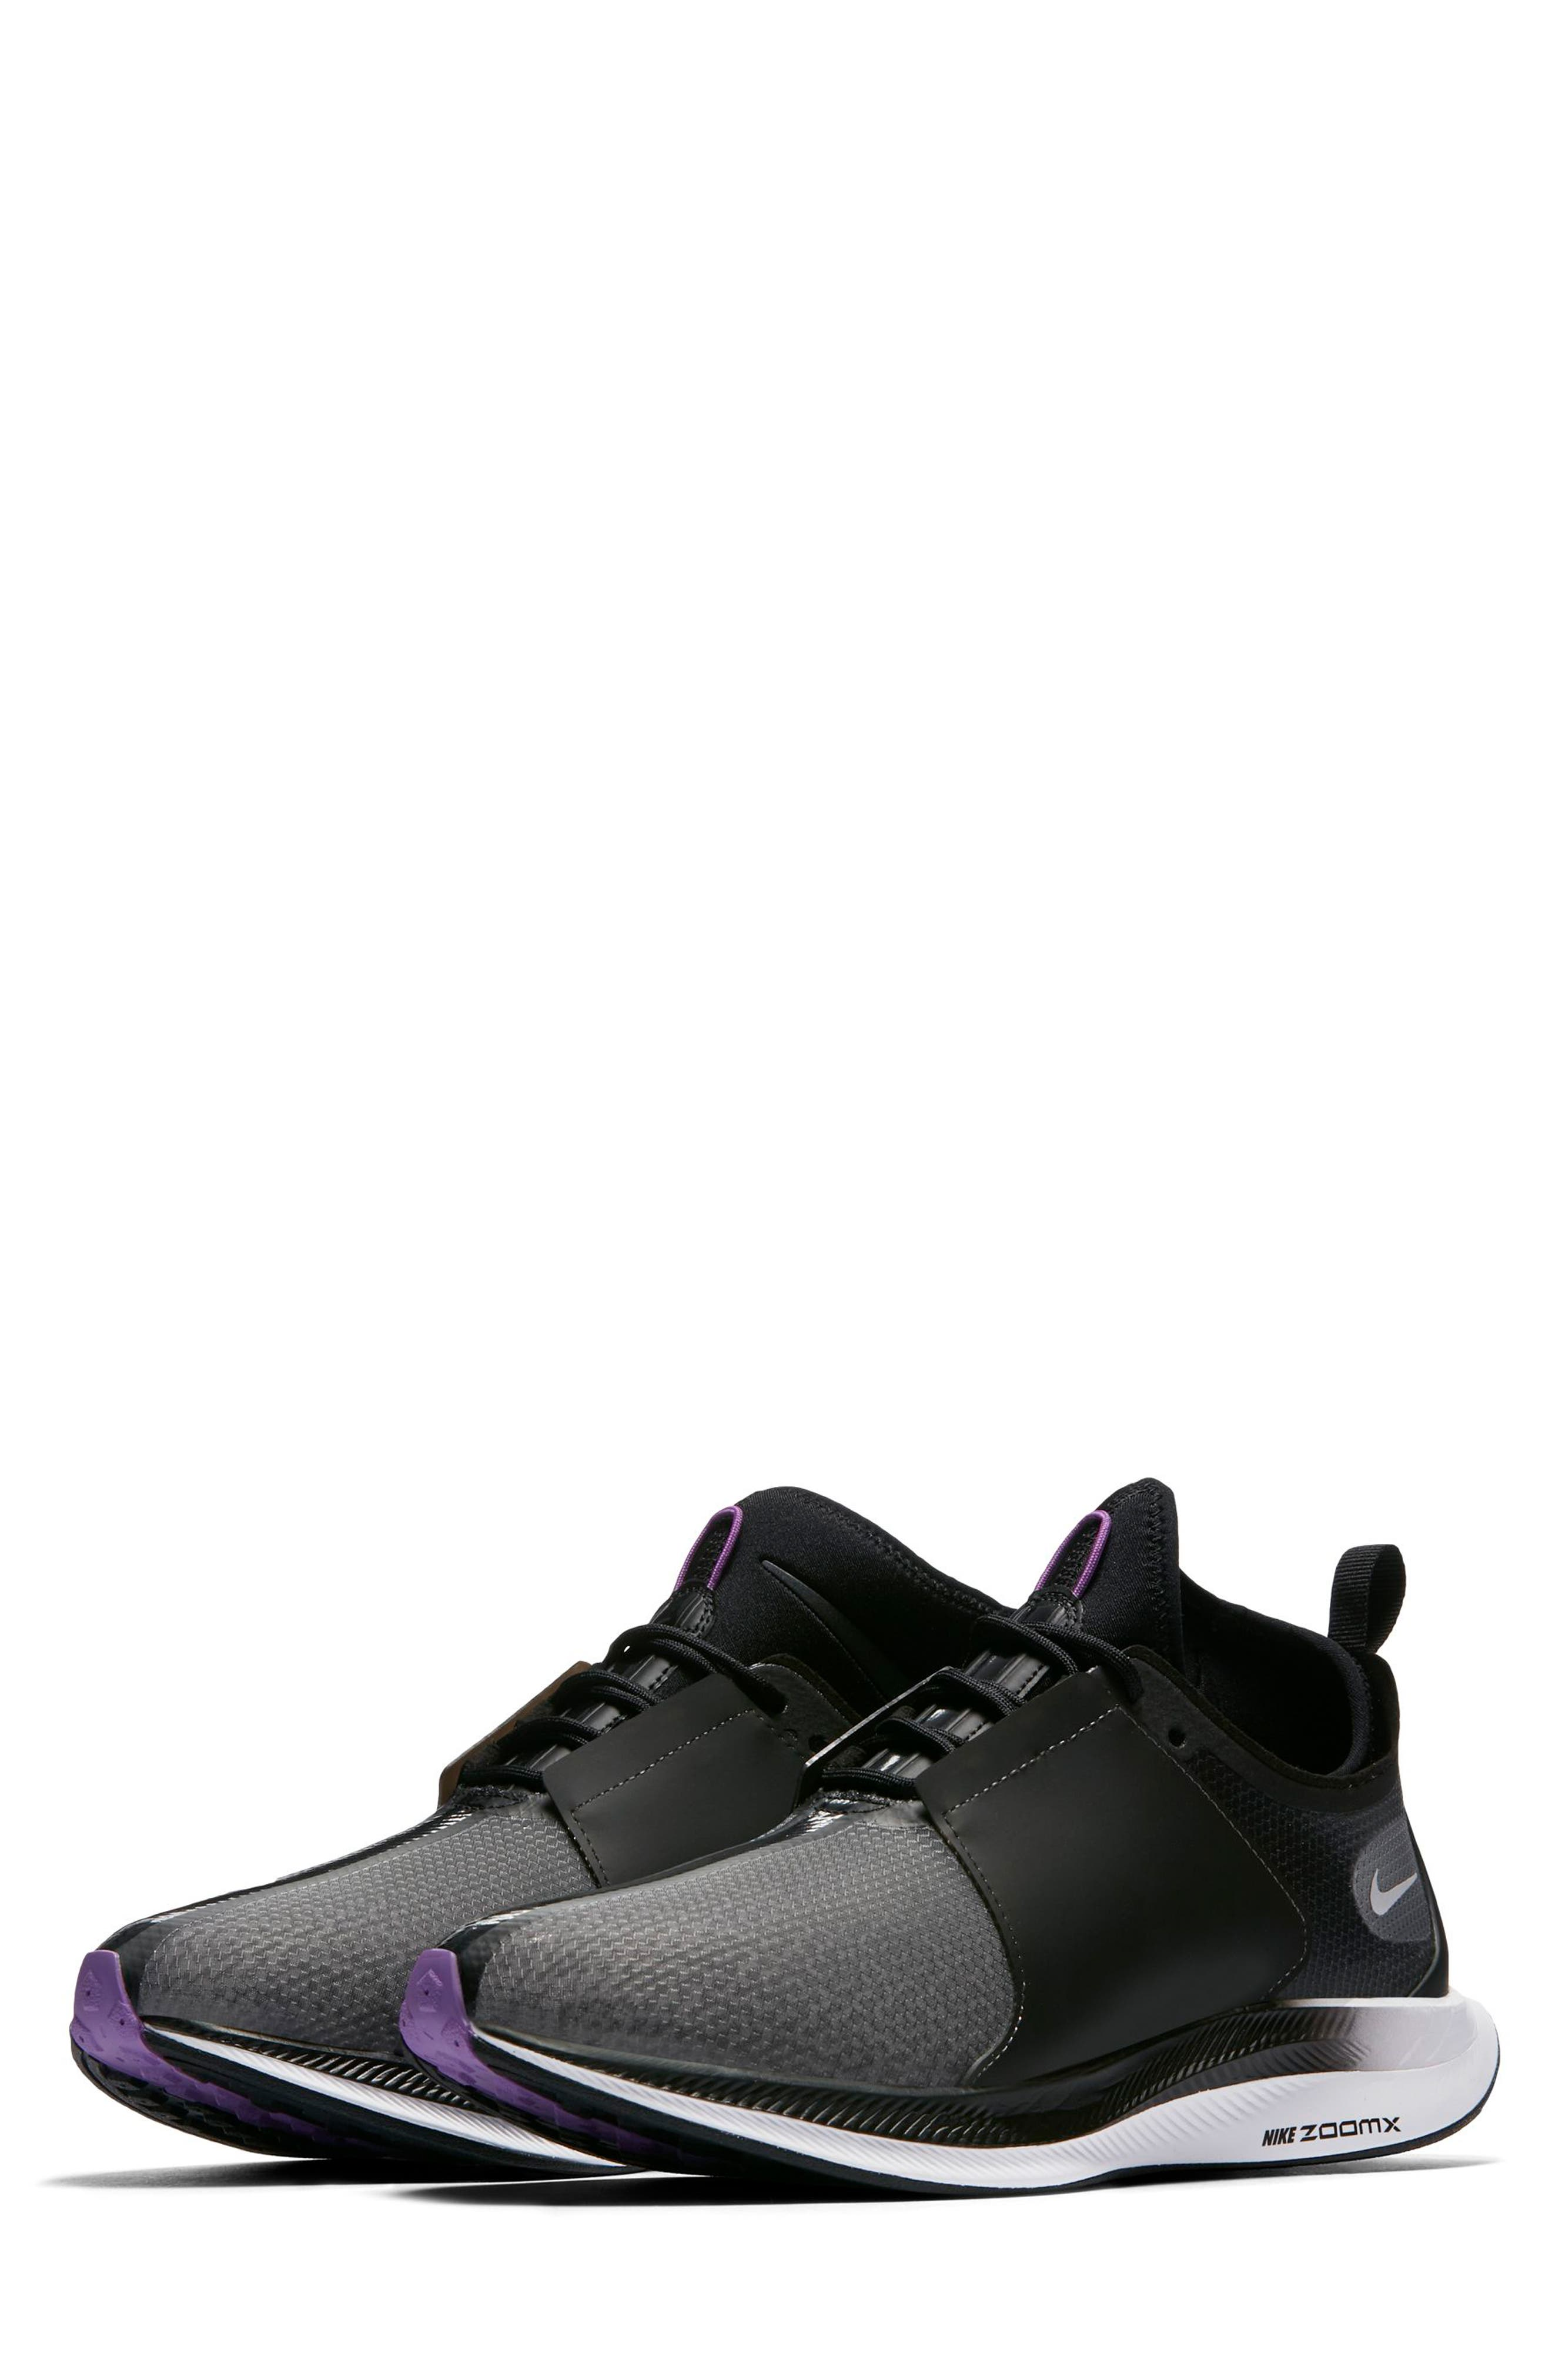 Zoom Pegasus Turbo XX Running Shoe, Main, color, BLACK/ BLACK/ WHITE